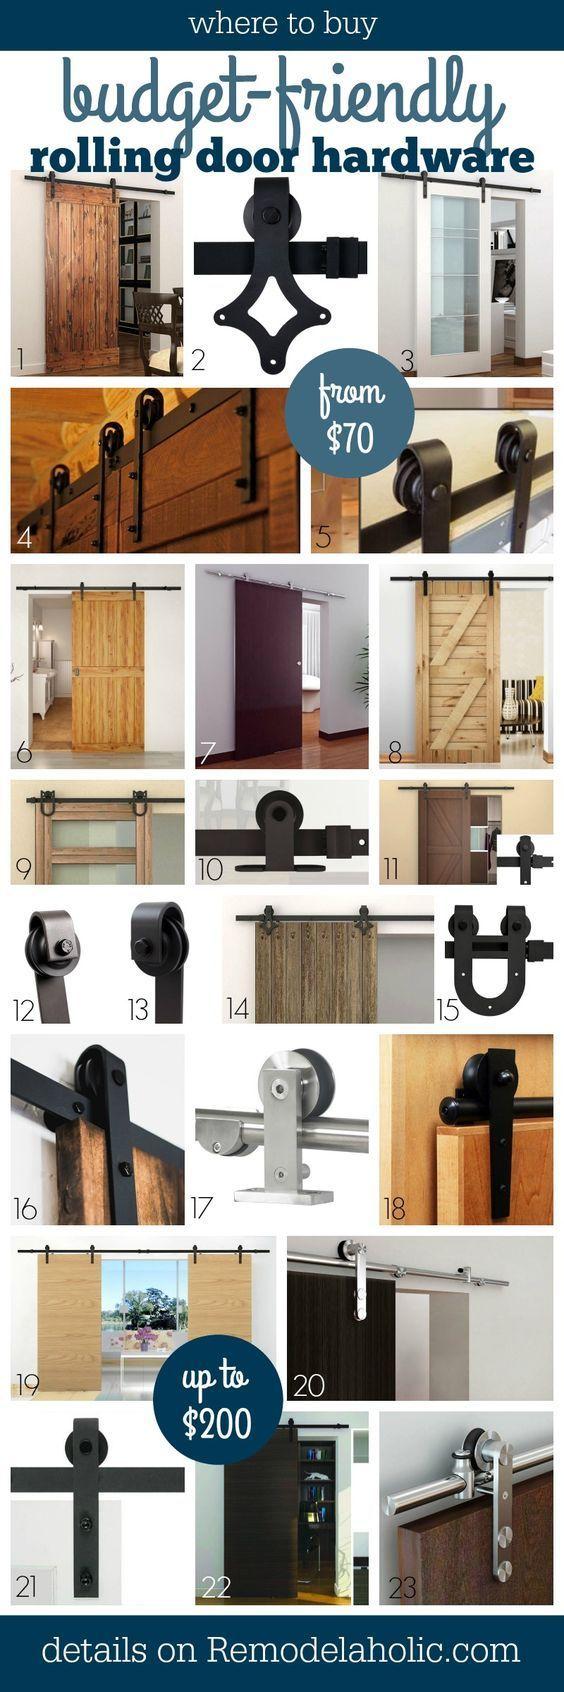 Where To Buy Budget Friendly Rolling Door Hardware For Barn Doors